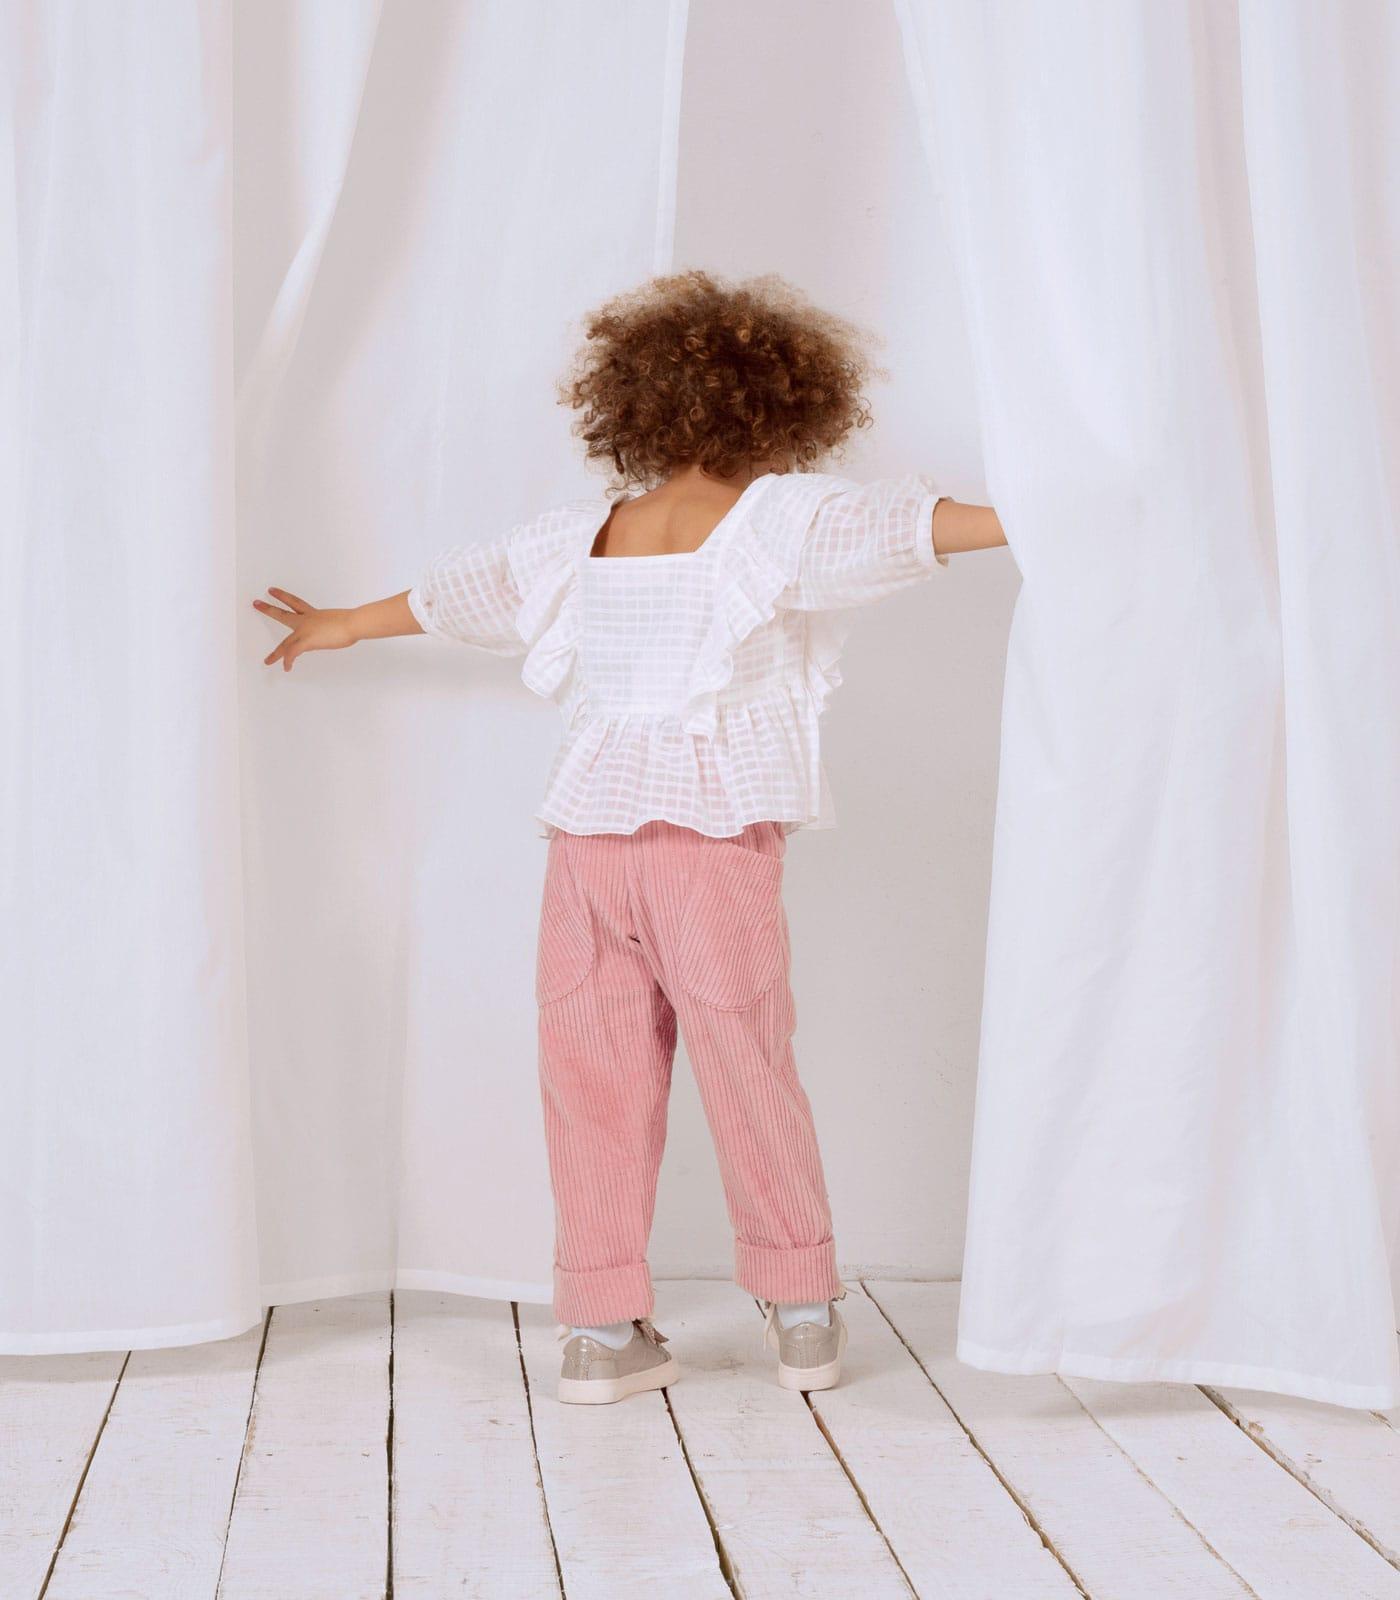 Nähanleitung für Kinder-Cordhose // HIMBEER